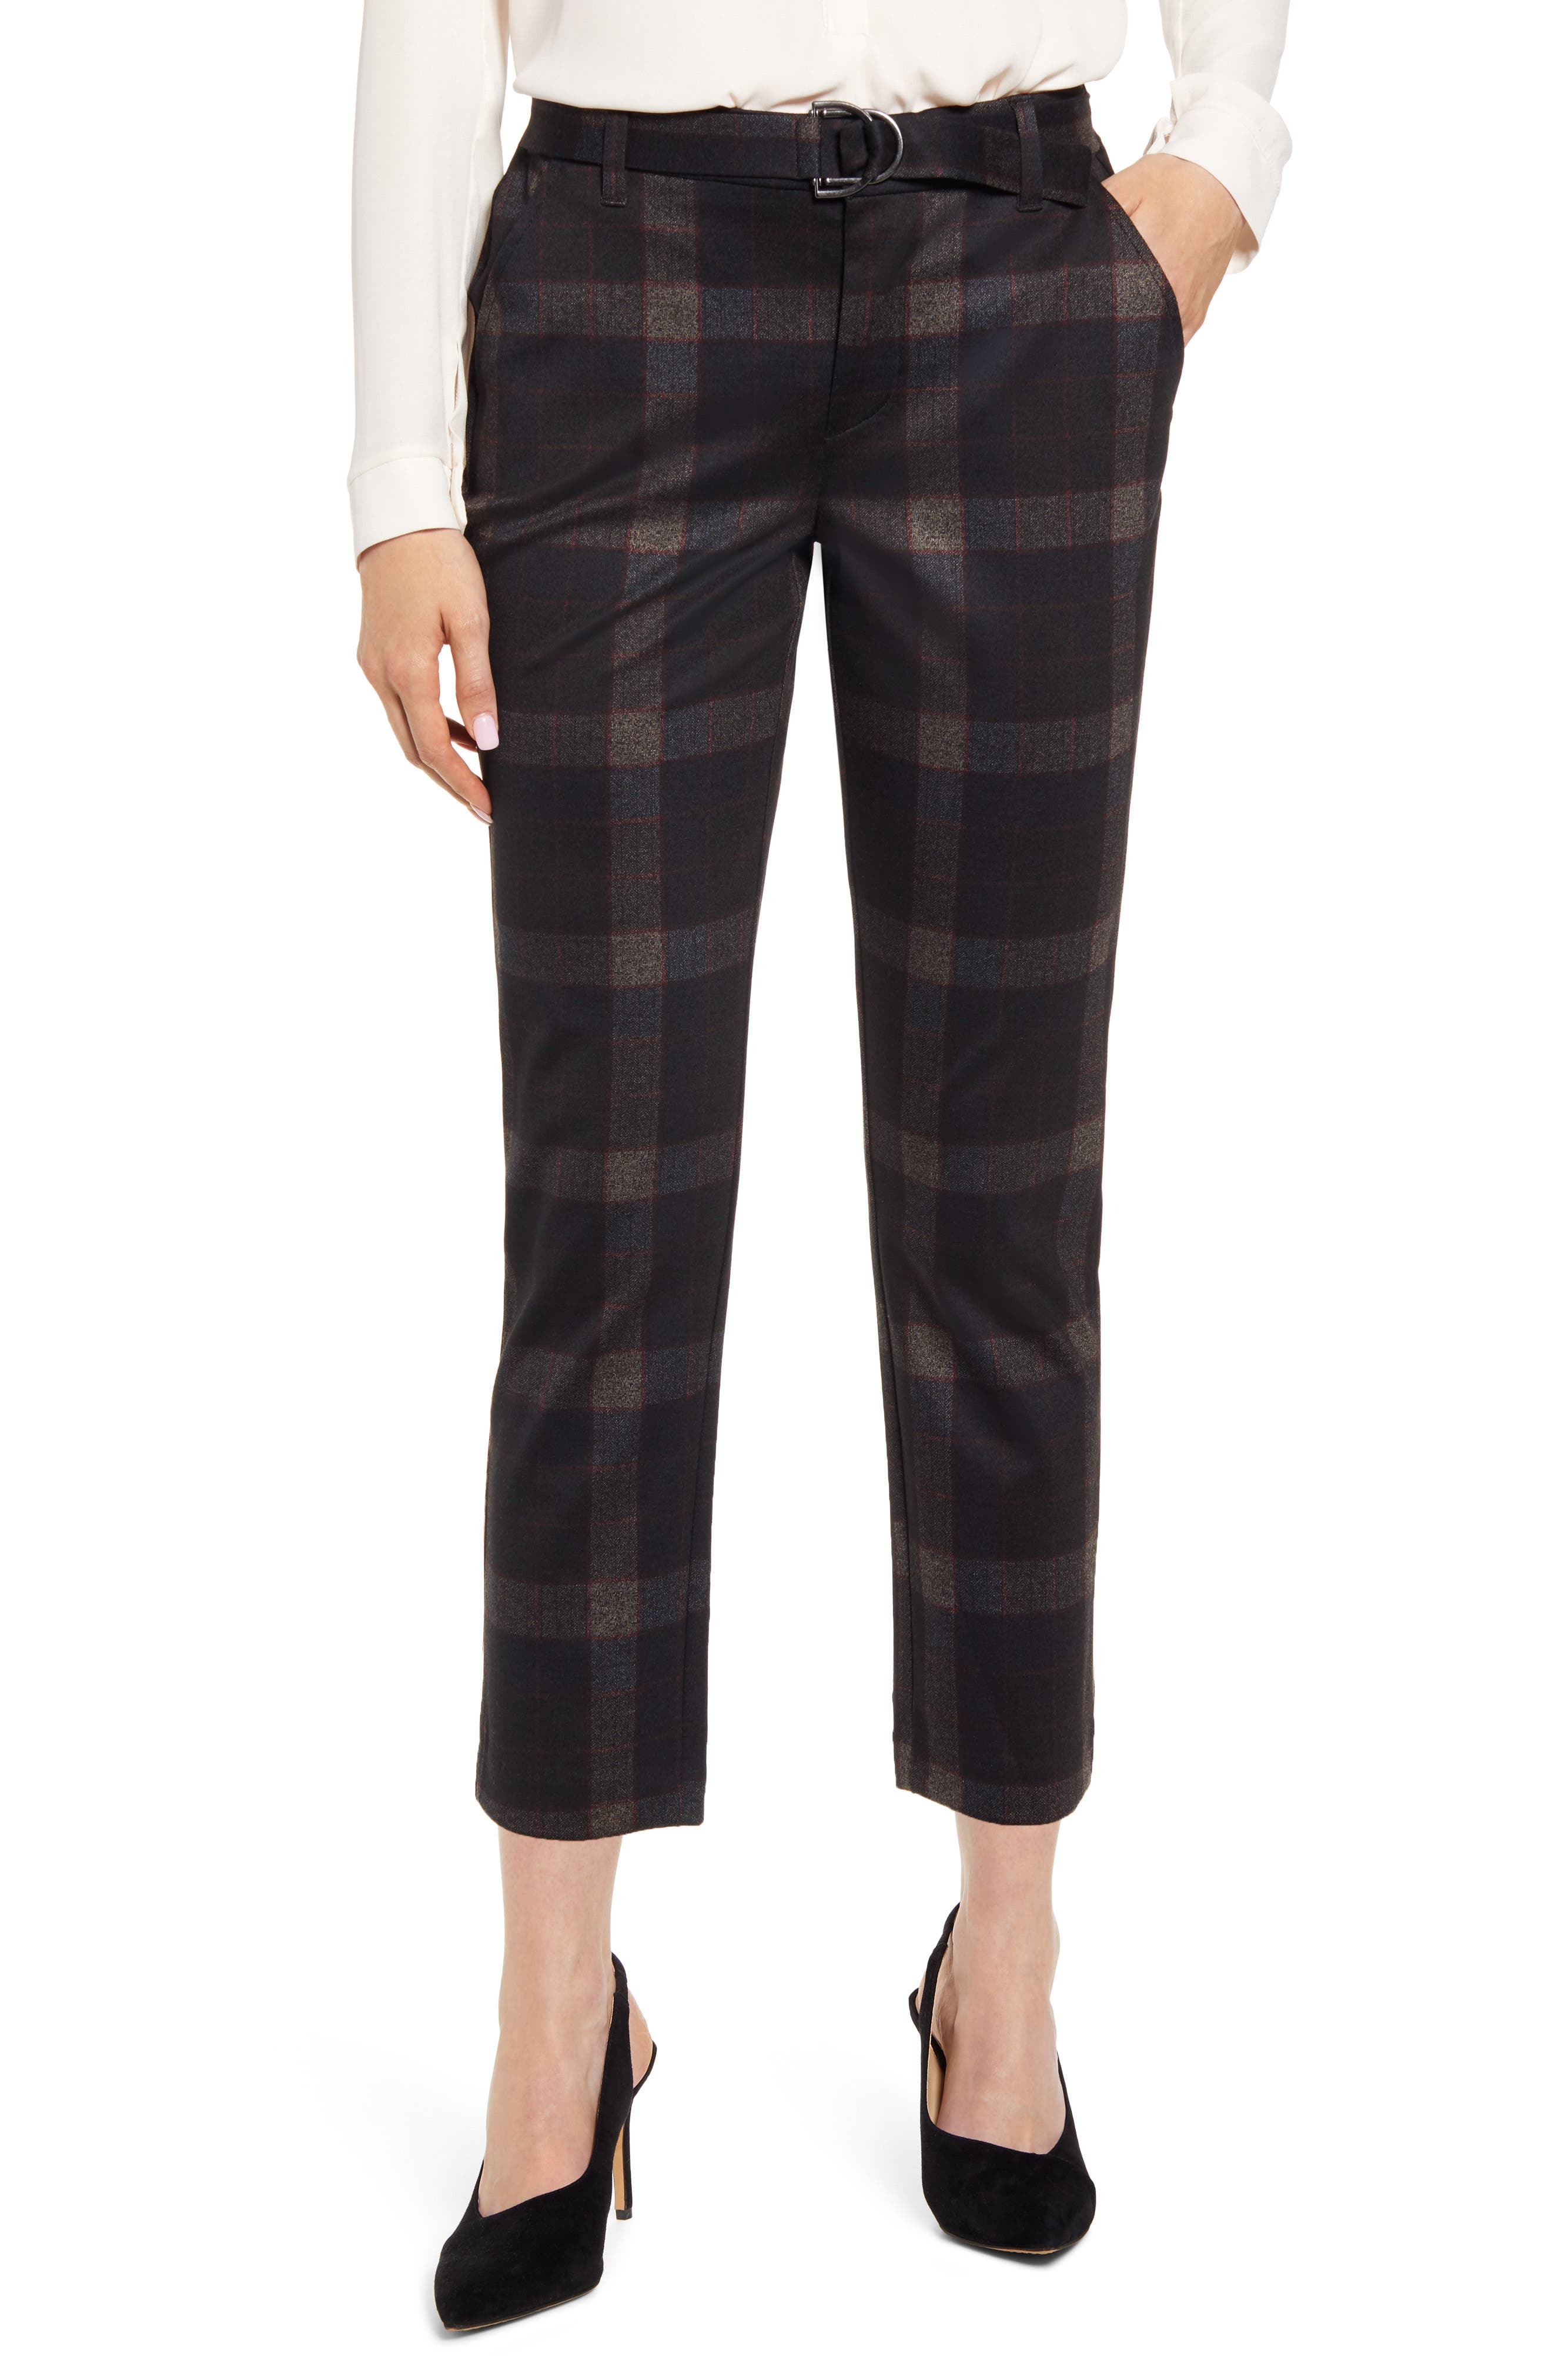 Wit & Wisdom Ab-solution Plaid High Waist Ankle Pants (Regular & Petite) (Nordstrom Exclusive)